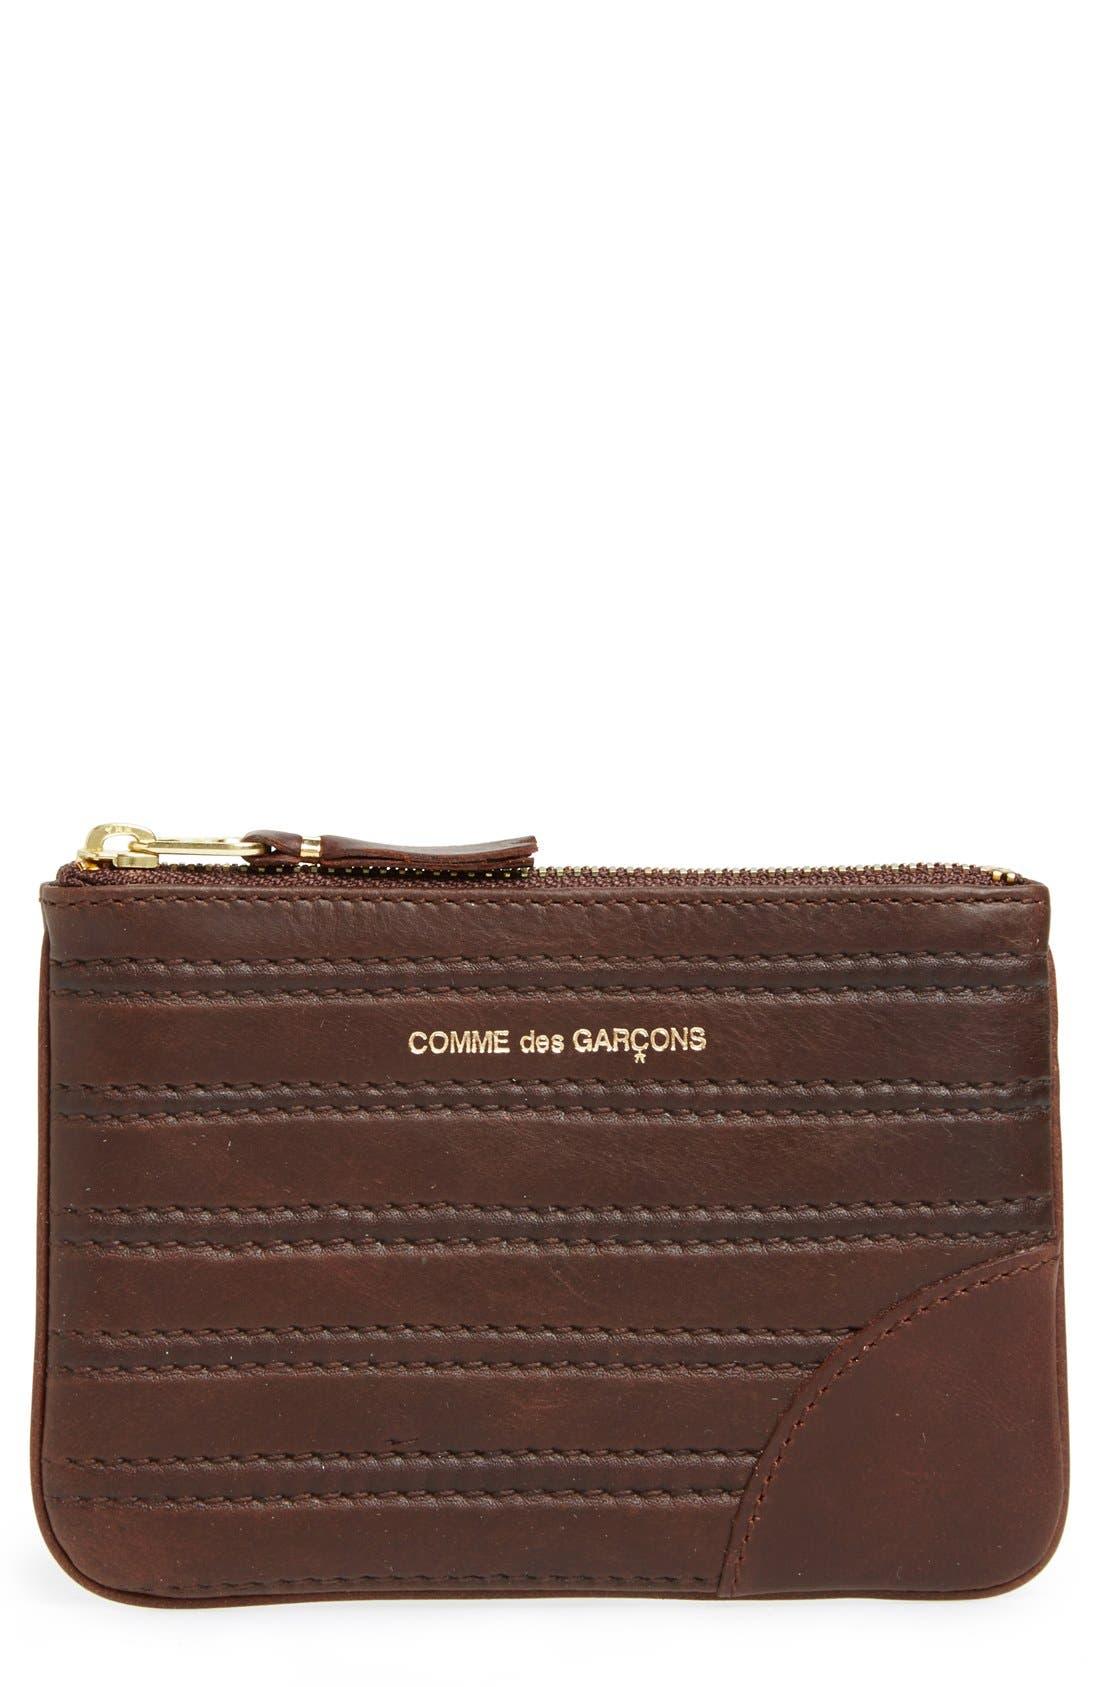 Main Image - Comme des Garçons Embossed Leather Top Zip Pouch Wallet